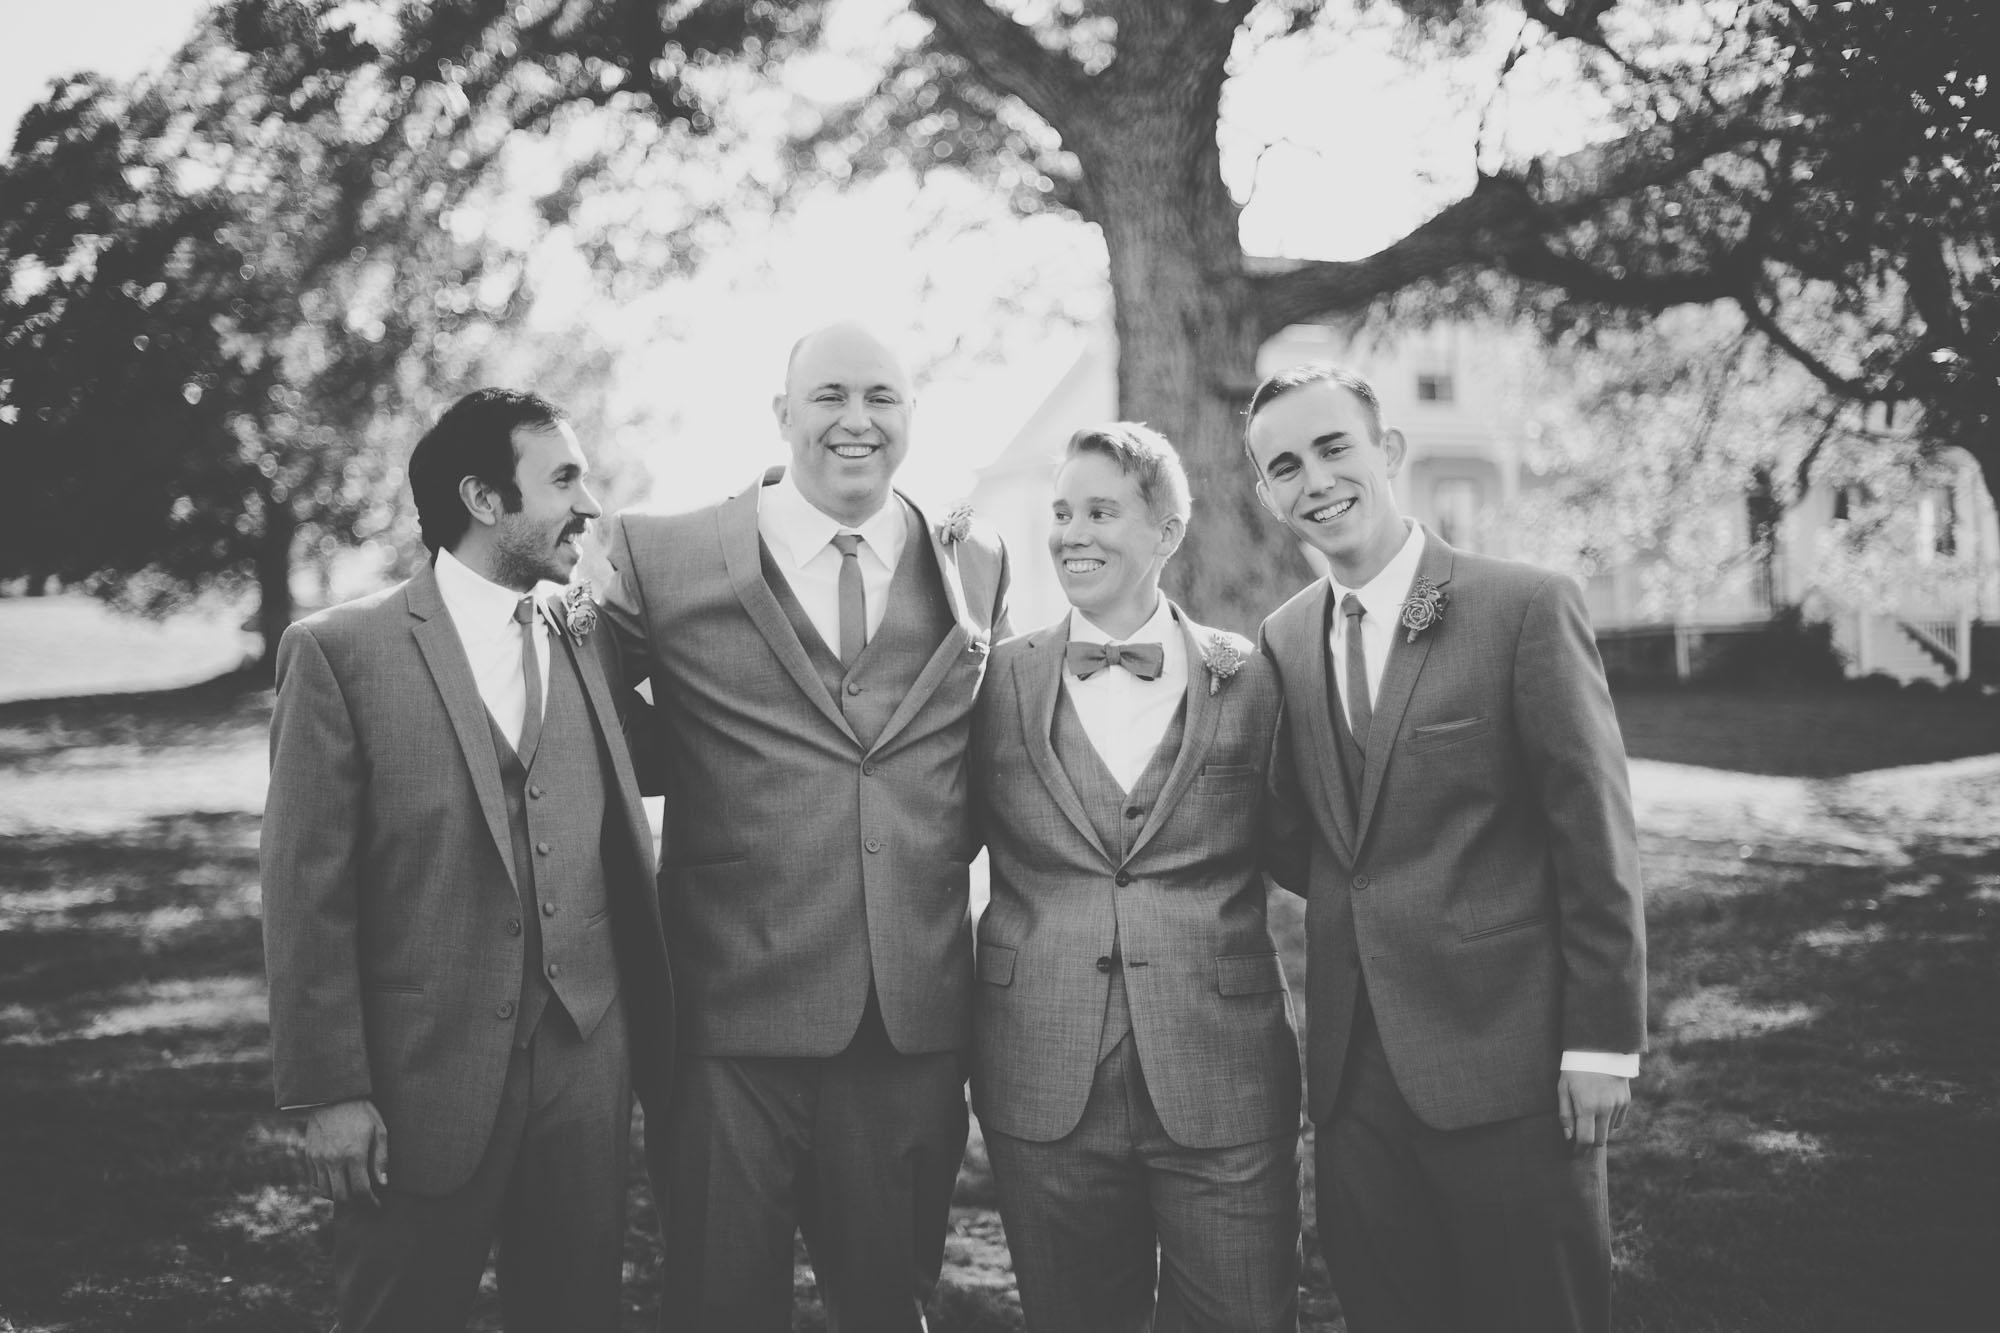 Gretchen_Gause_Petaluma_Olympias_Valley_Wedding_Photo-123.jpg